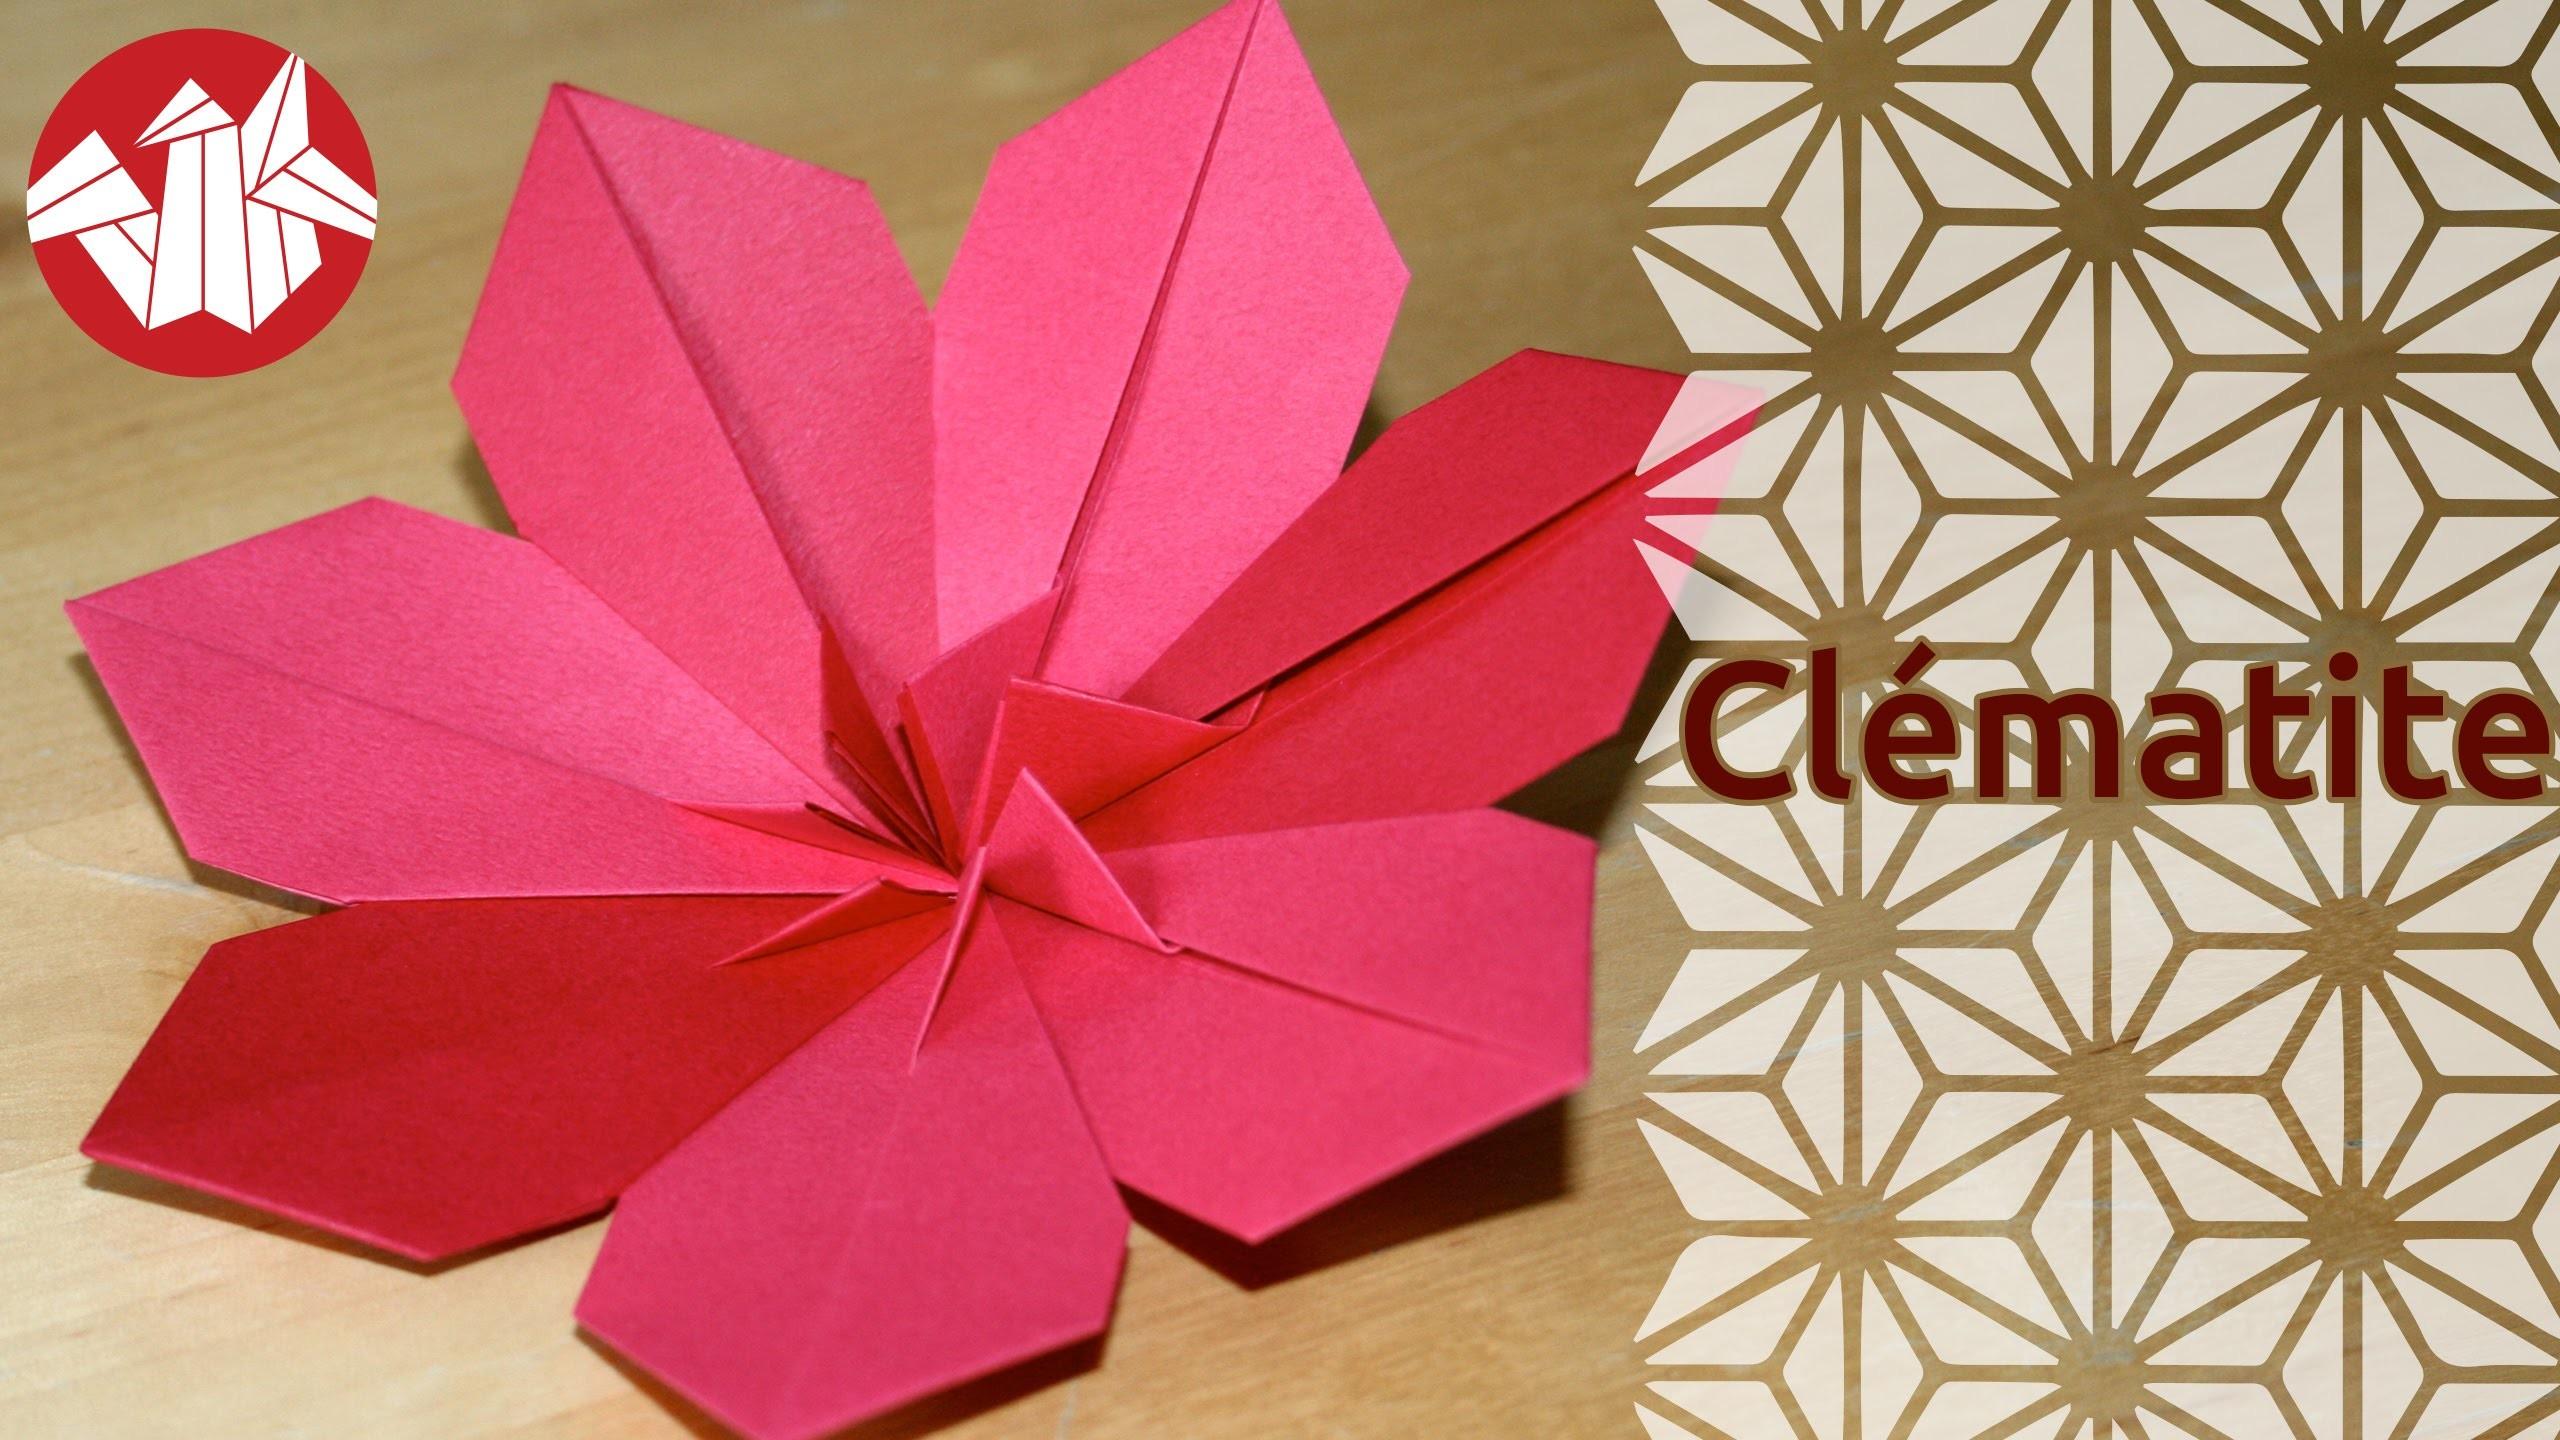 origami cl matite clematis senbazuru. Black Bedroom Furniture Sets. Home Design Ideas